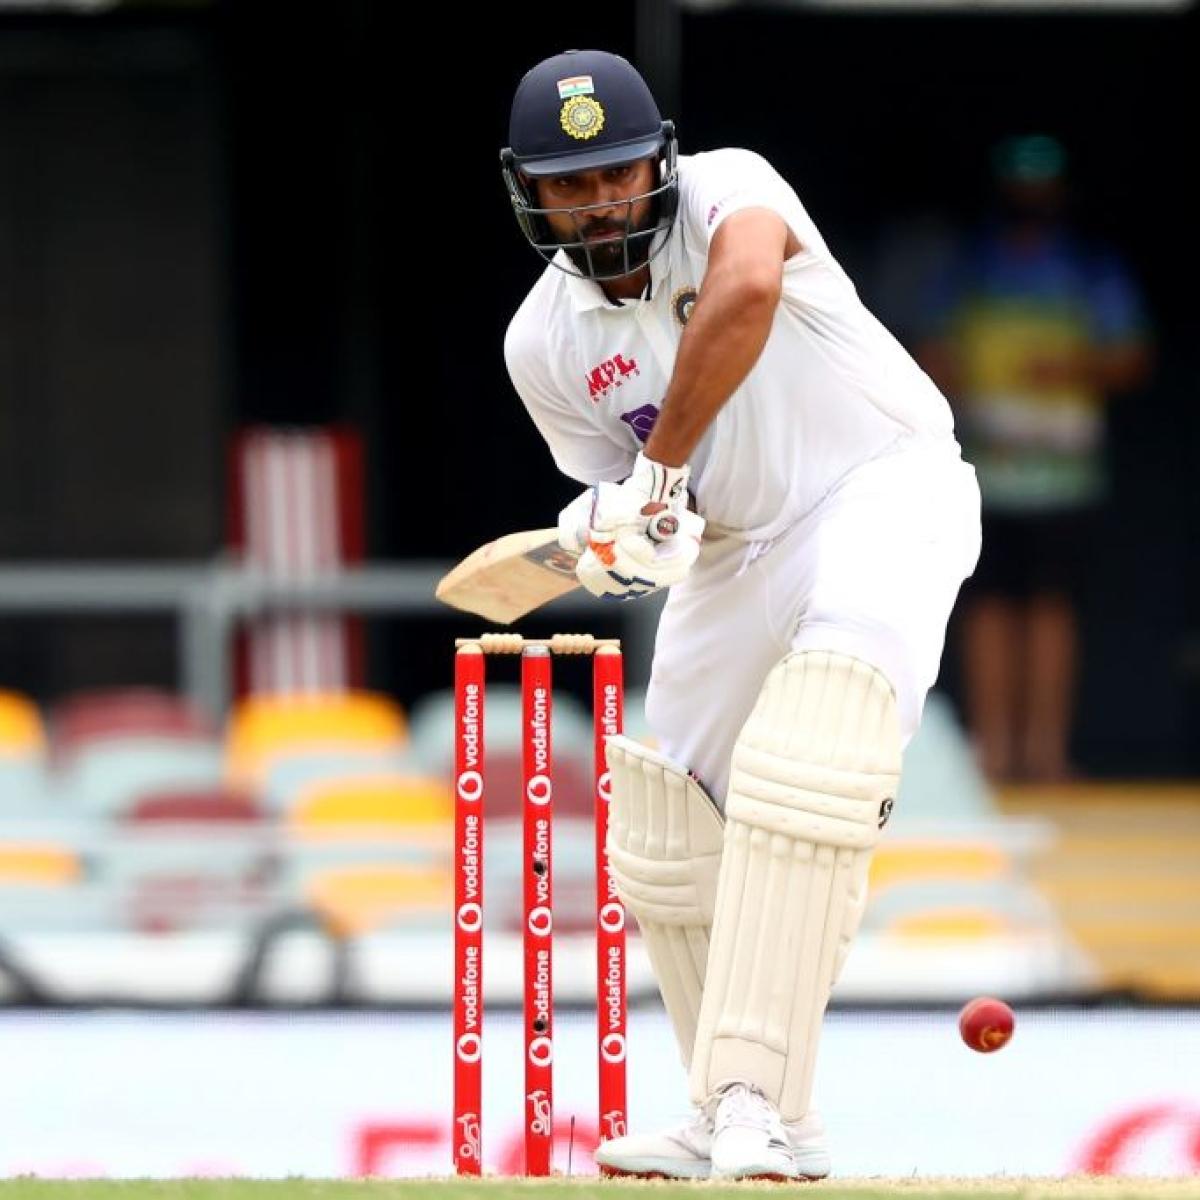 Ind vs Aus, 4th Test: Sunil Gavaskar slams Rohit Sharma for 'unnecessary' shot